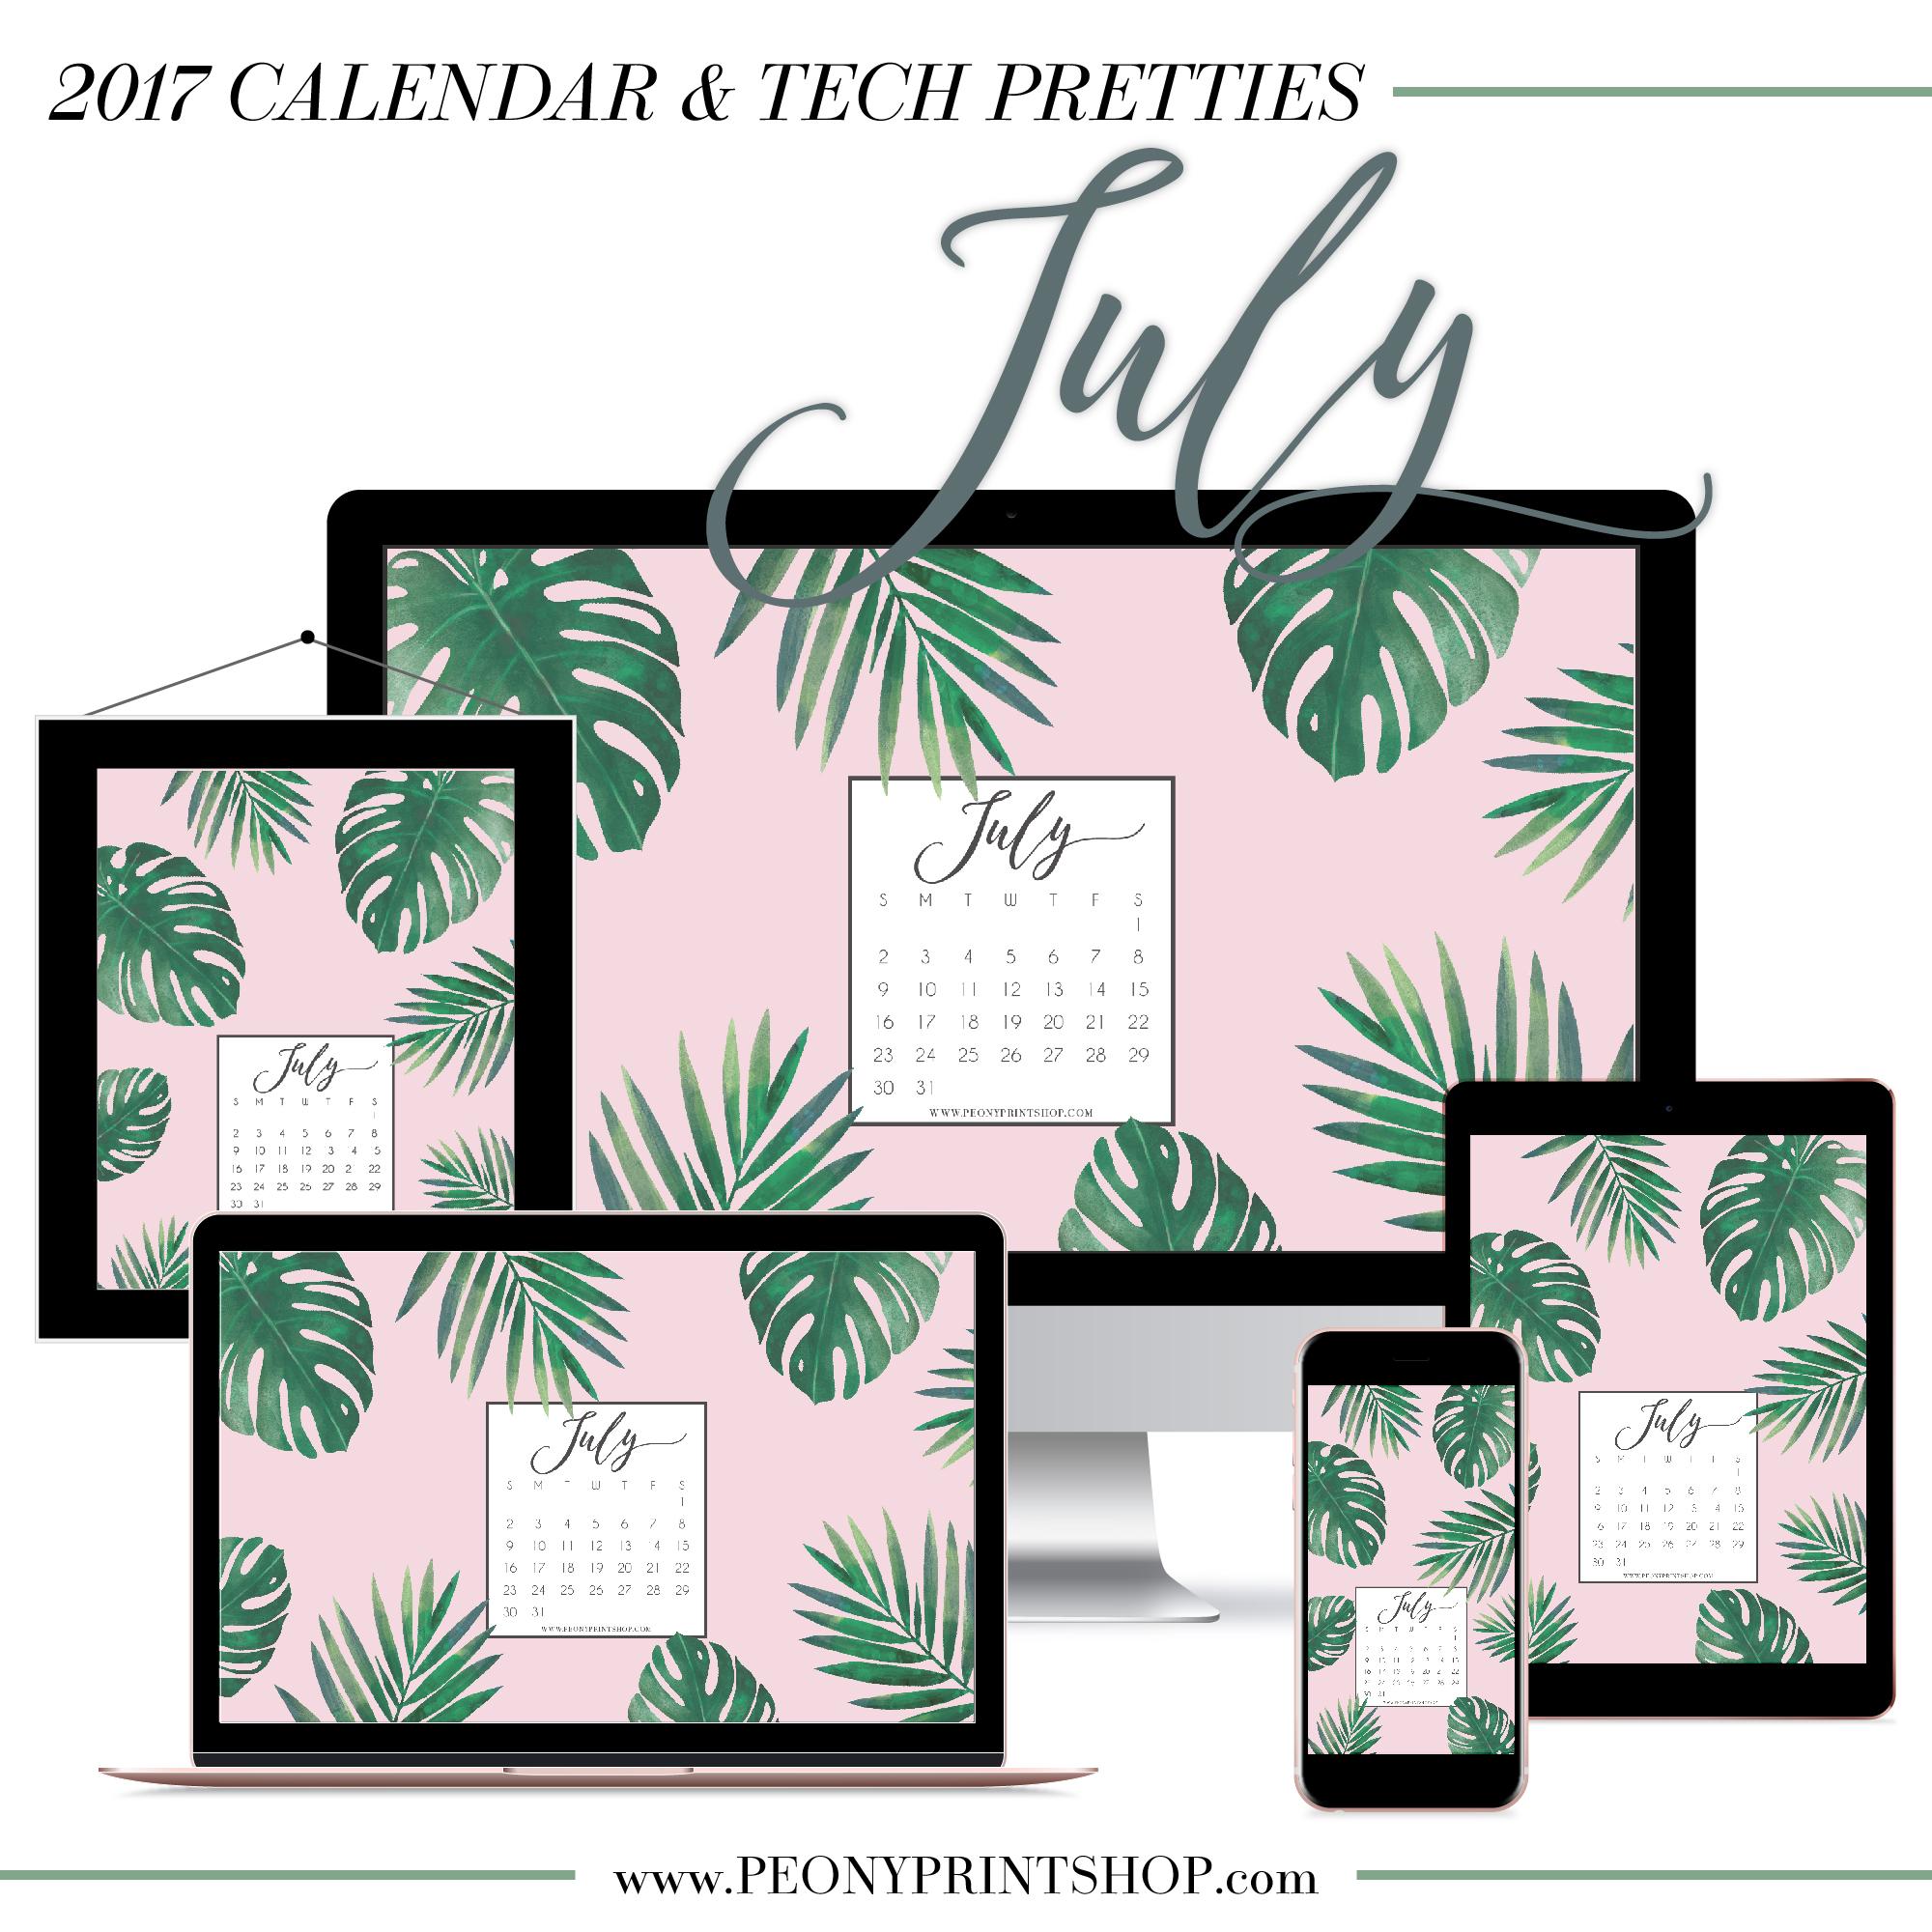 2017 July Calendar + Tech Pretties  |  PeonyPrintshop.com